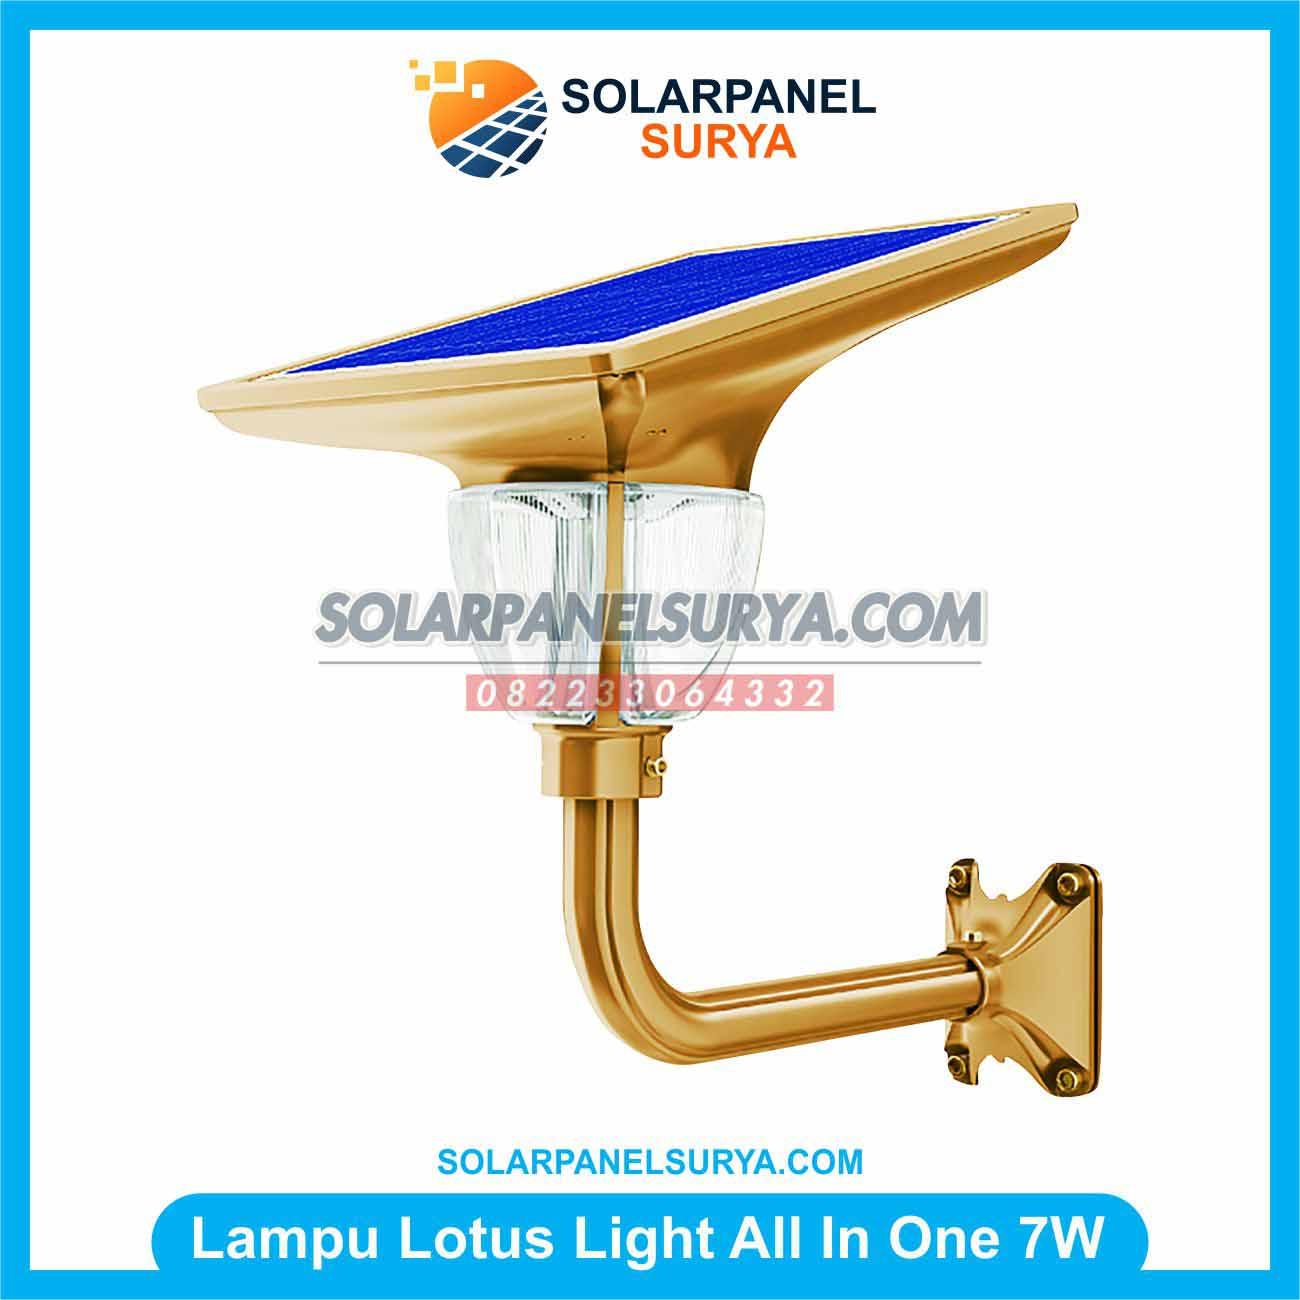 Jual Lampu Taman Solarcell All In One Lotus Light 7 Watt